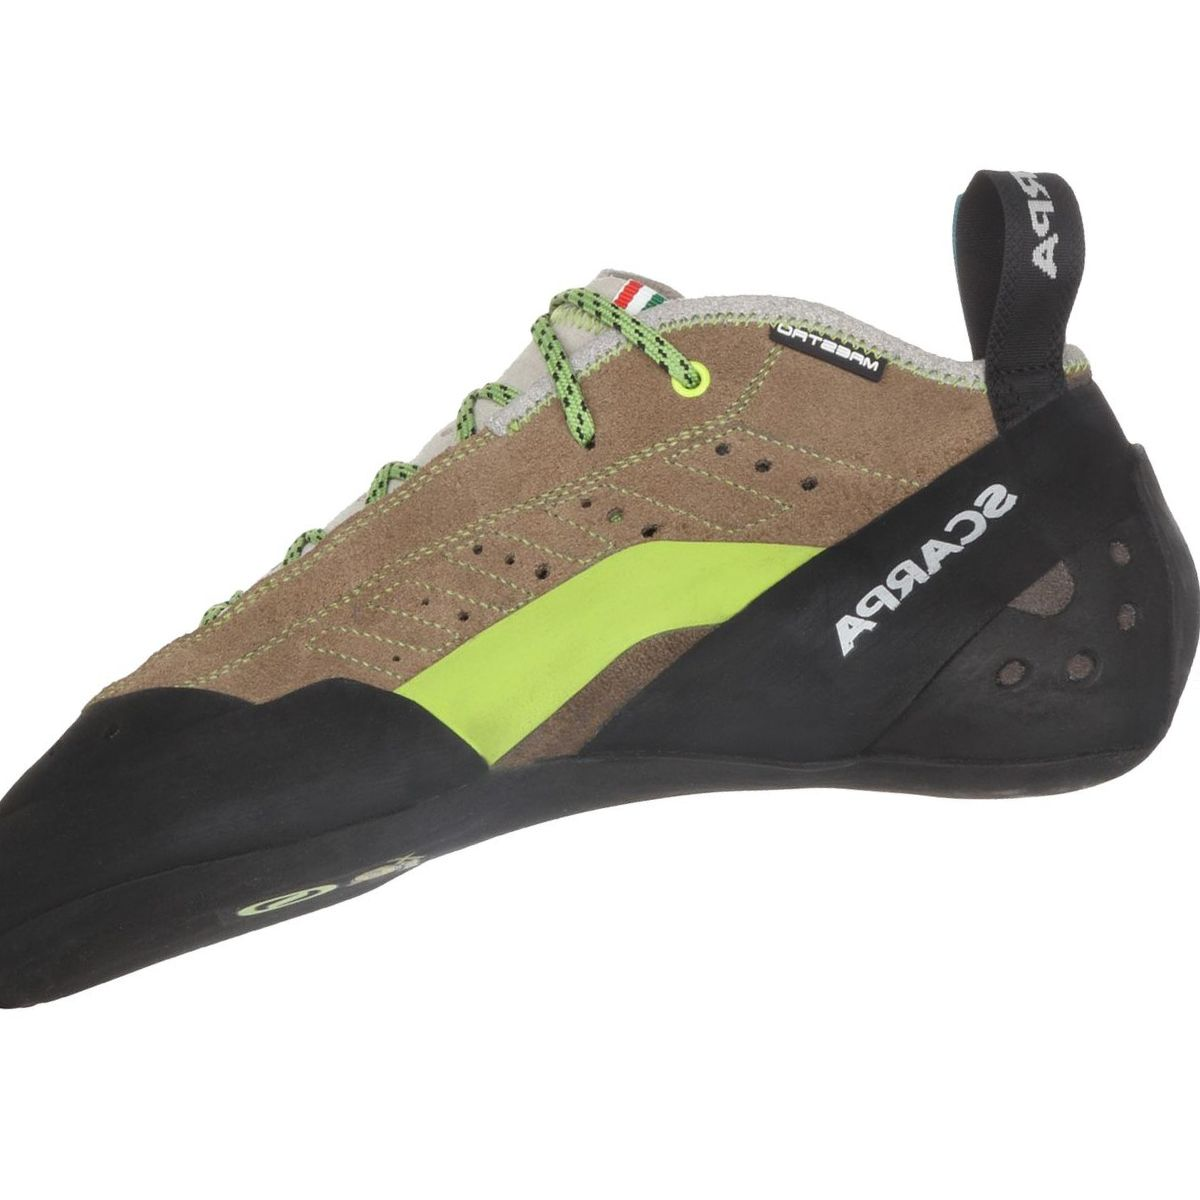 Scarpa Maestro Mid Eco Climbing Shoe - Men's